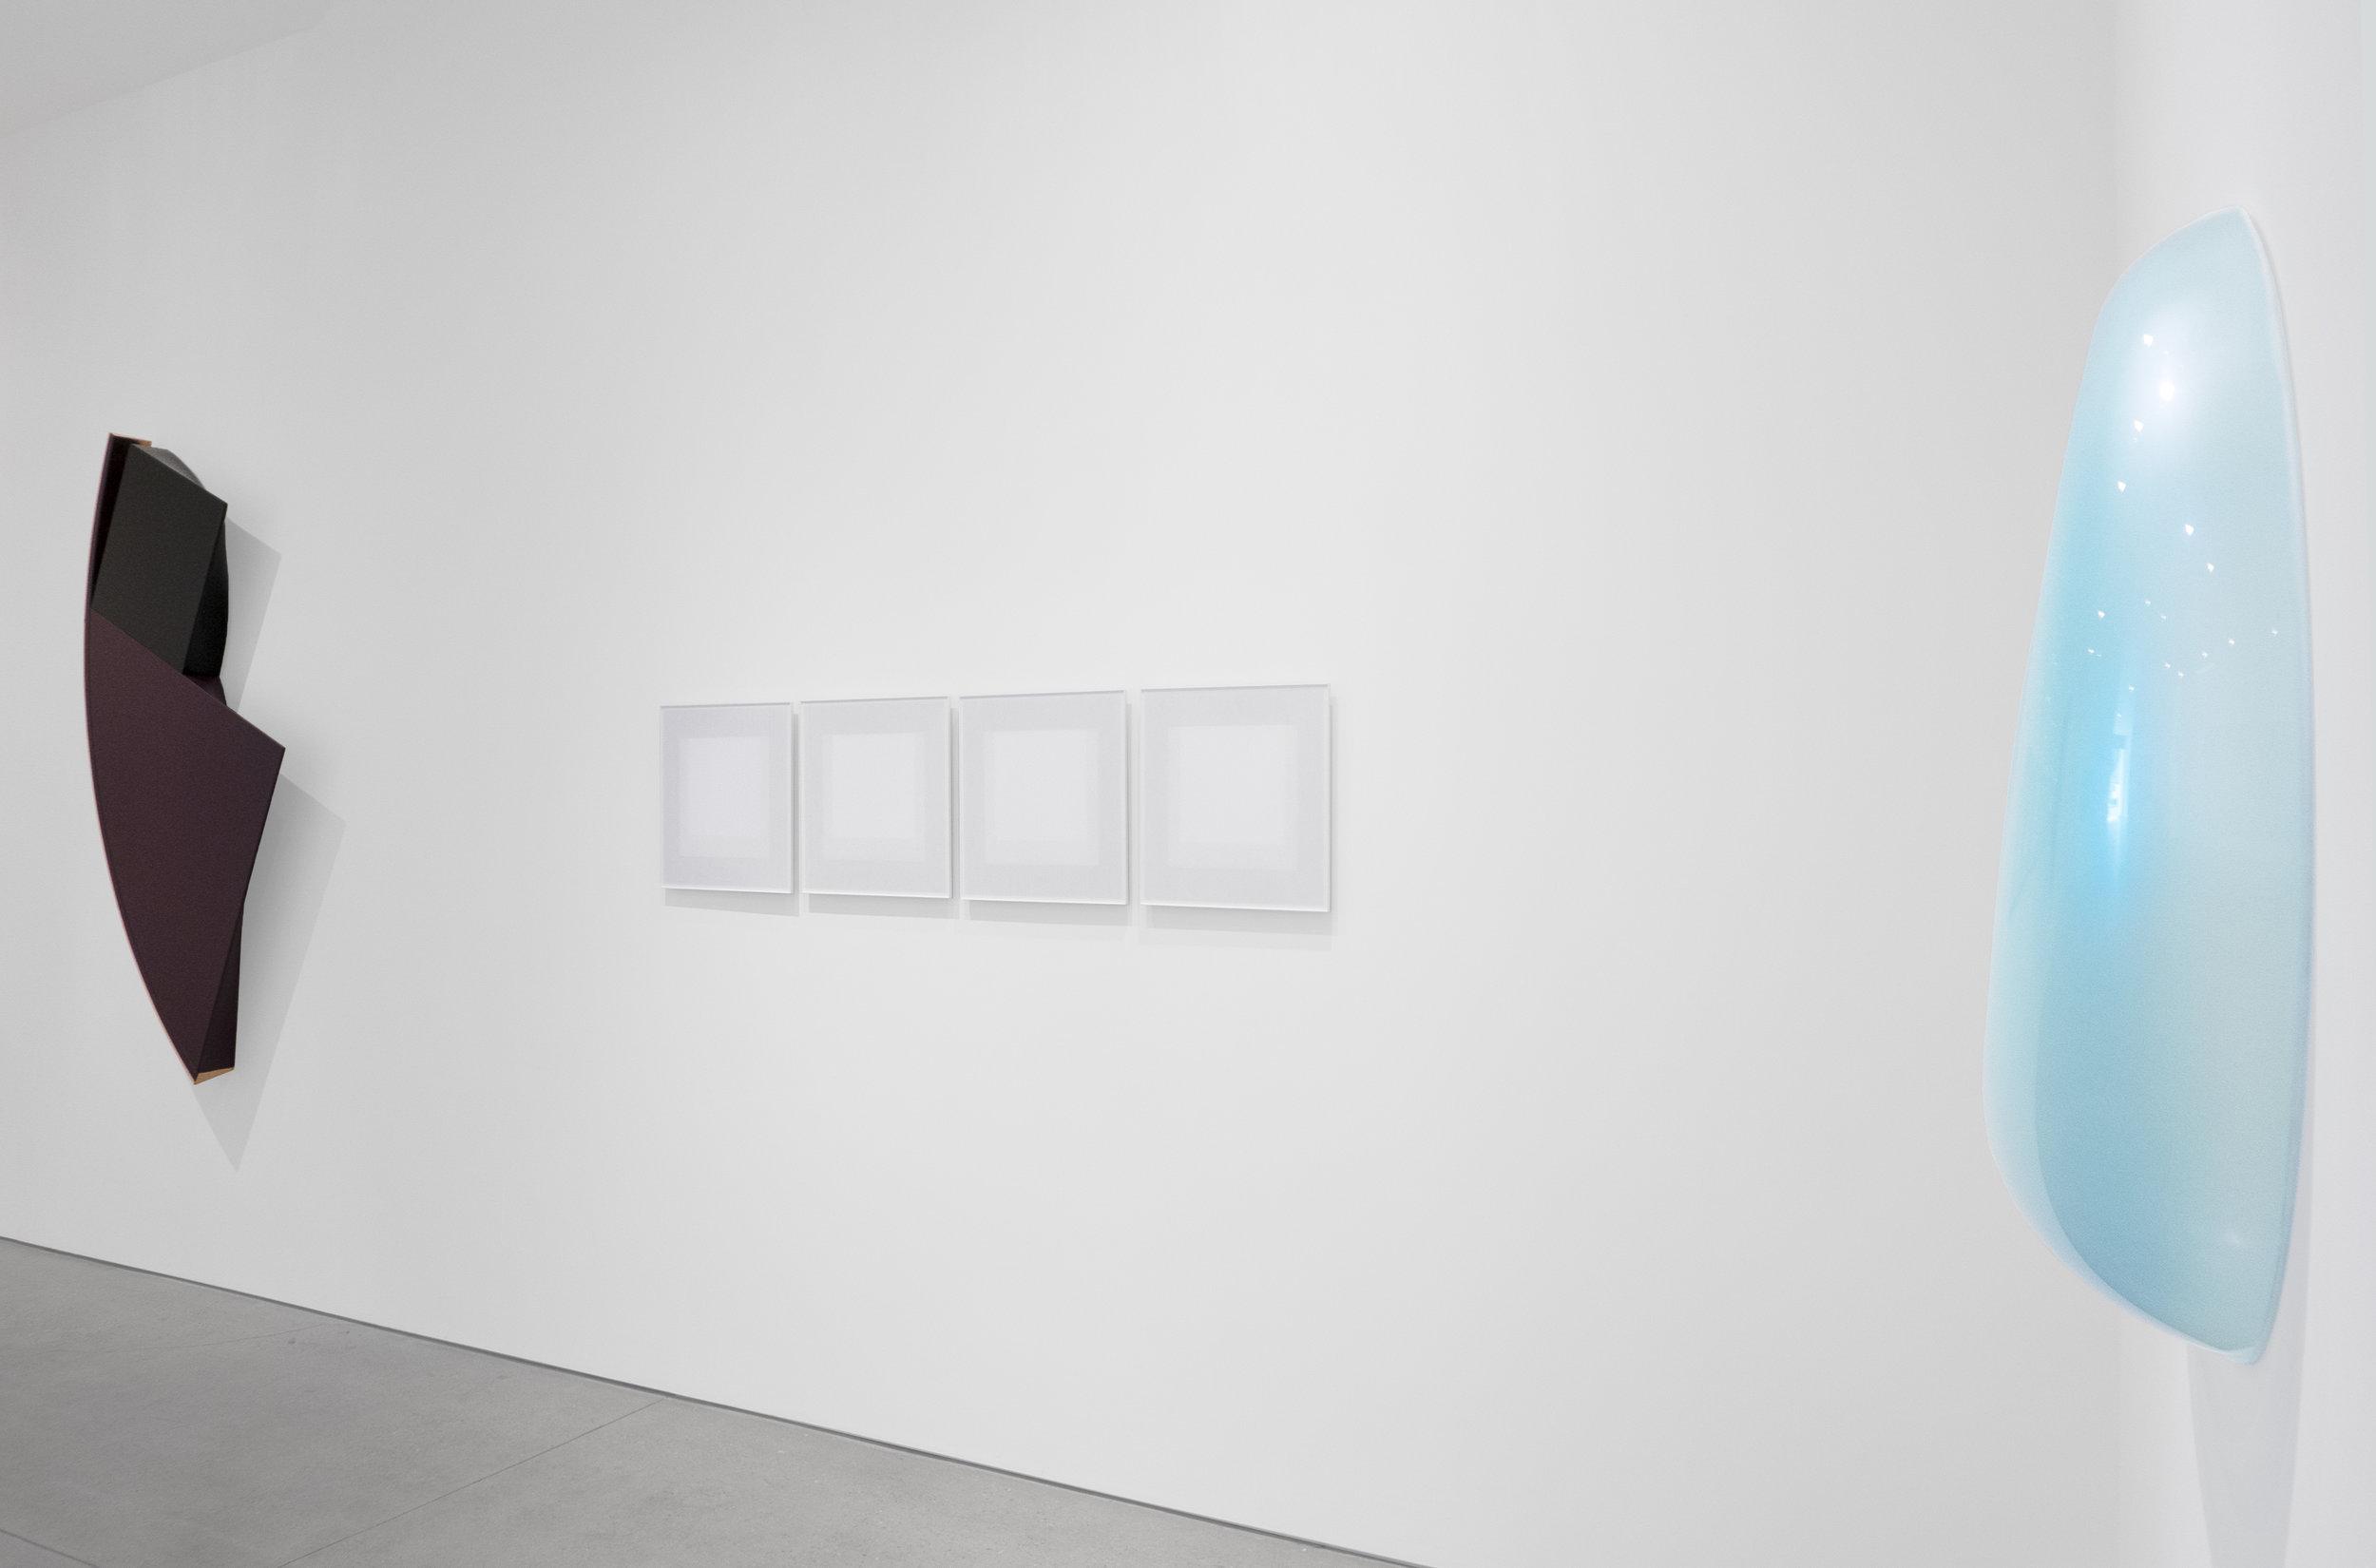 25 Years_Peter Blake Gallery_2019_Installation View_27.jpg